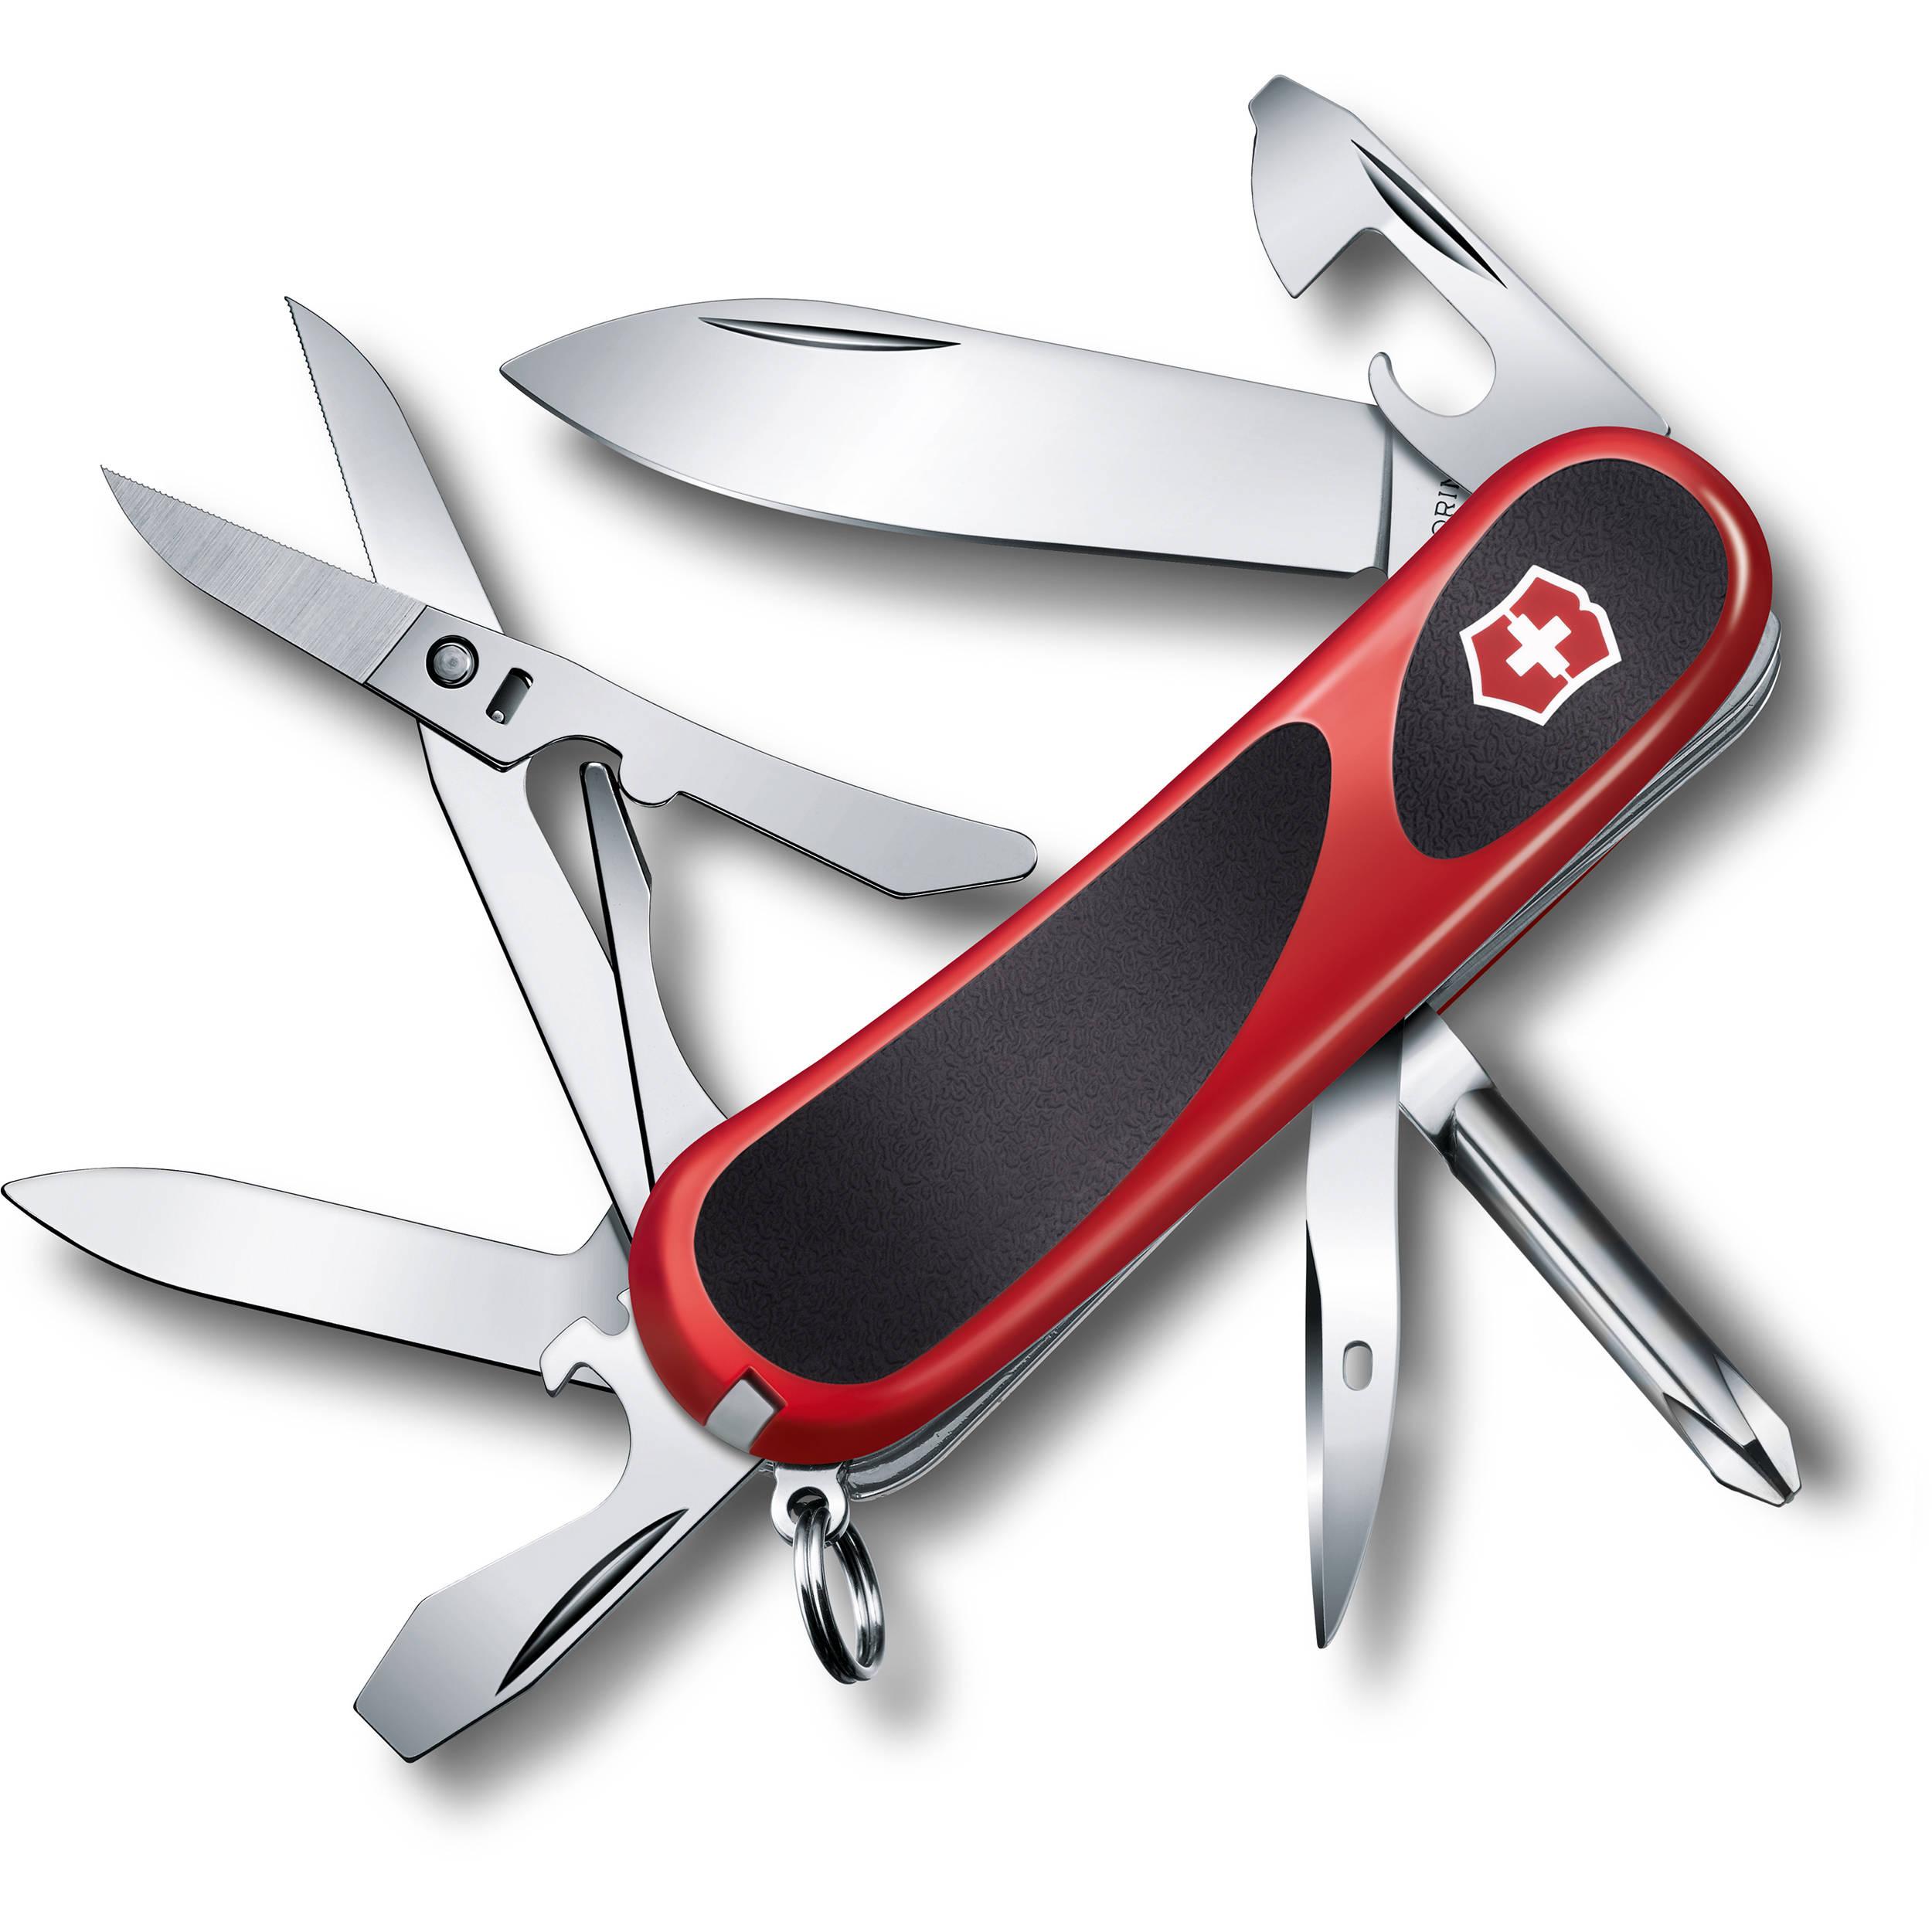 Victorinox Evogrip 16 Pocket Knife 2 4903 Cus2 B Amp H Photo Video